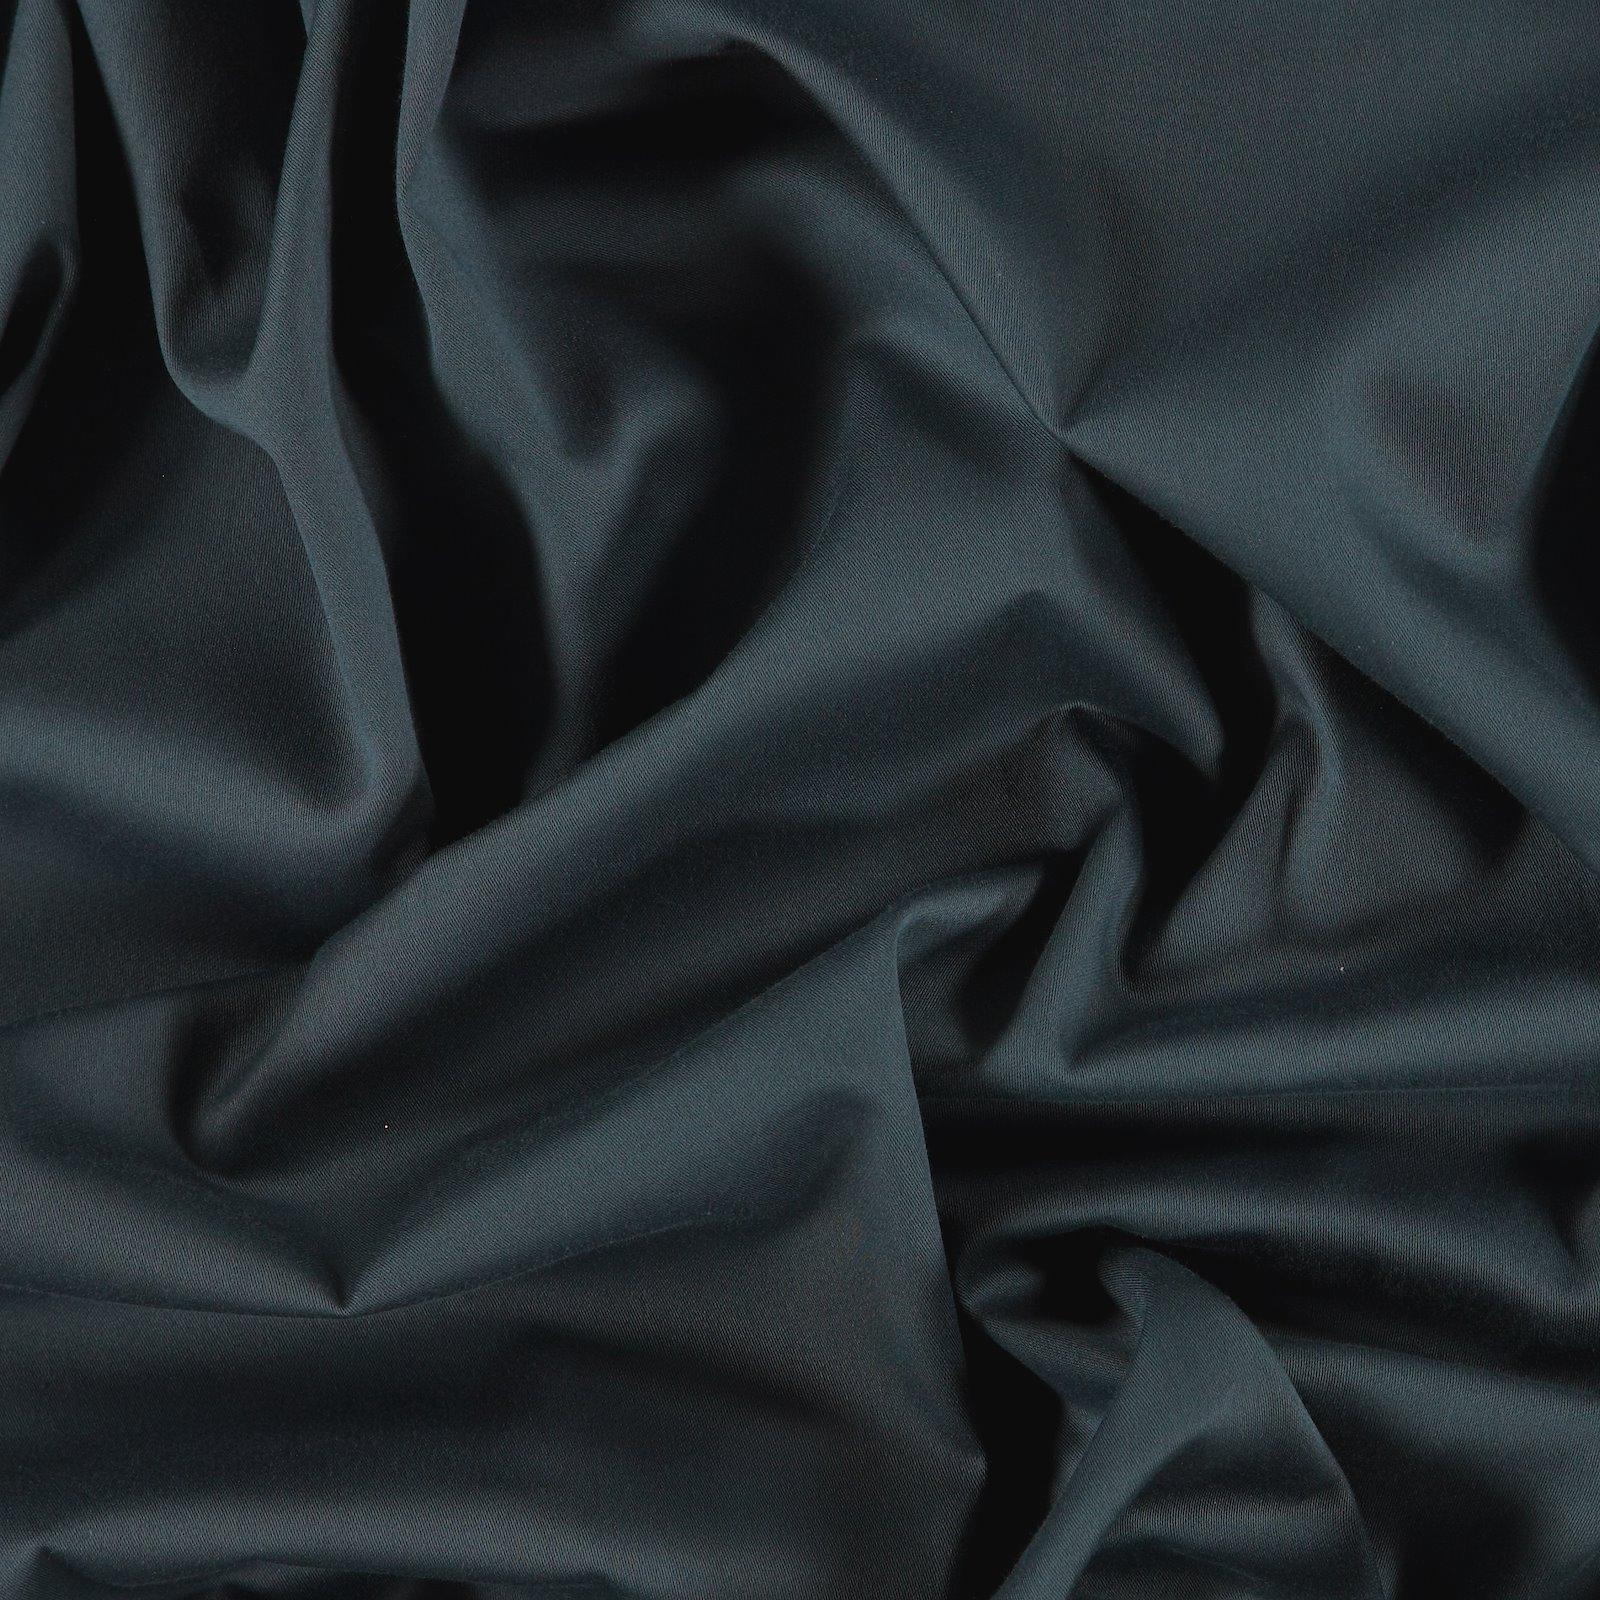 Cotton satin dark petrol blue 816167_pack